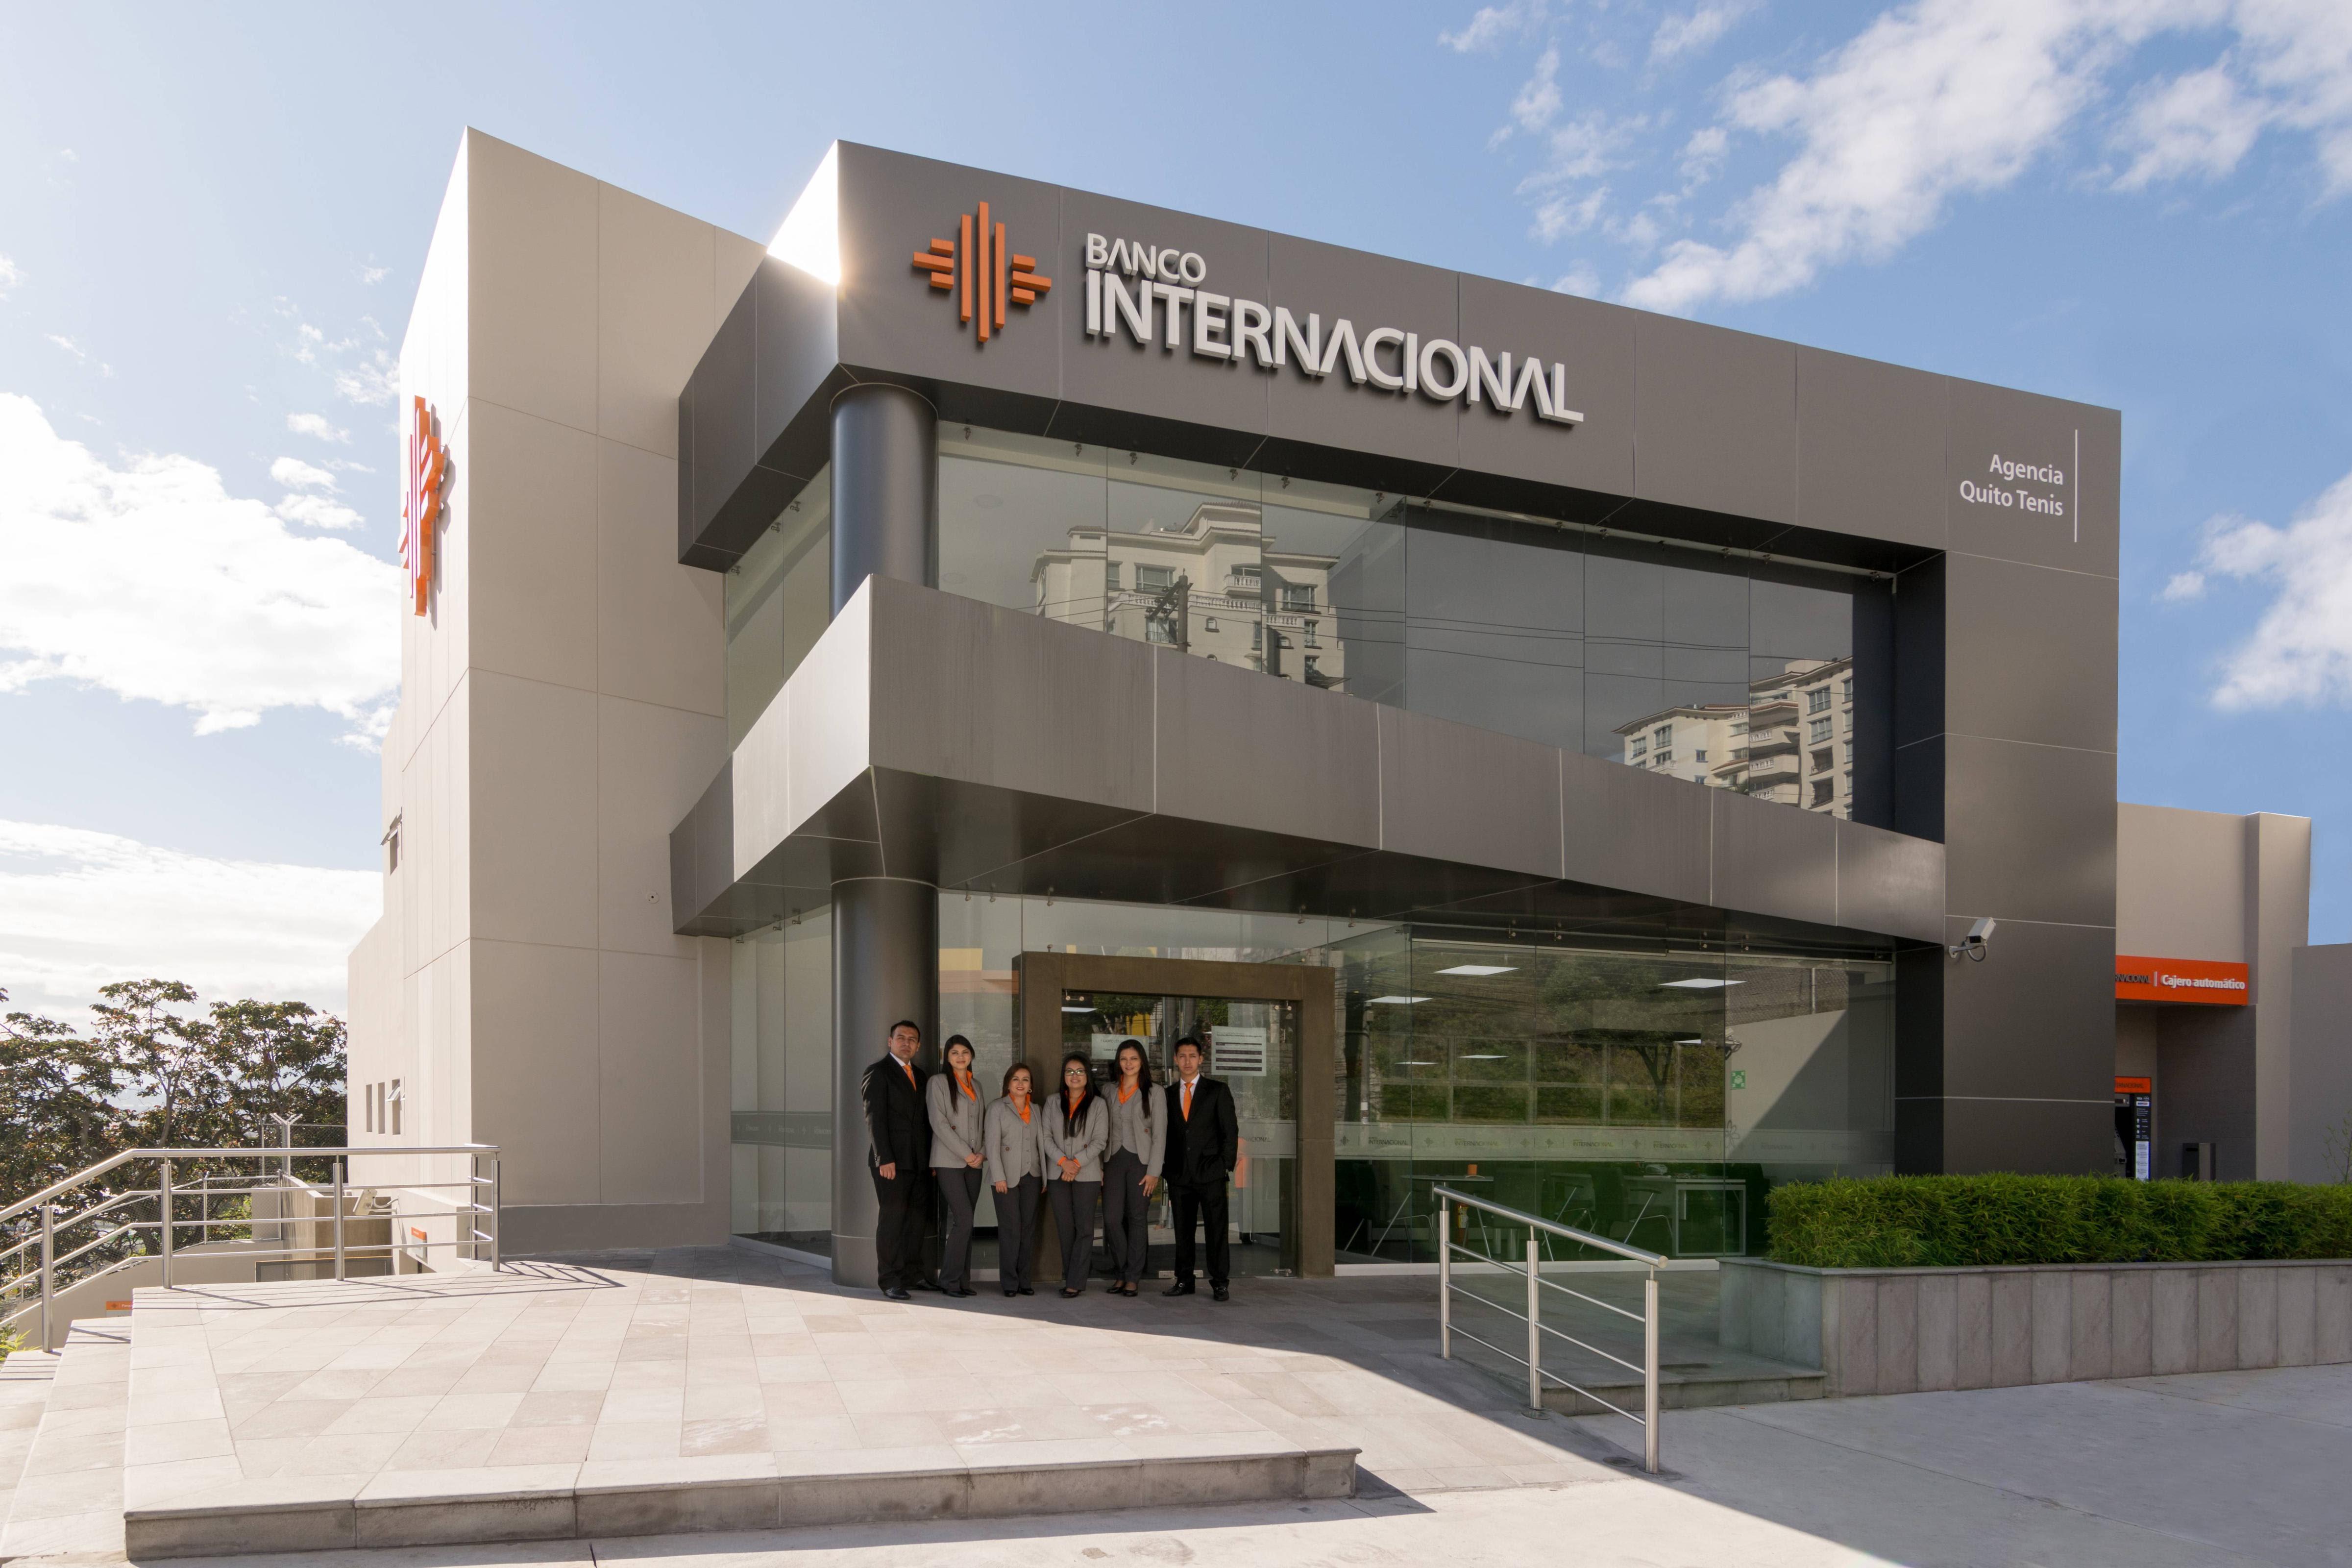 Banco Internacional inaugura moderna agencia en Quito Tenis